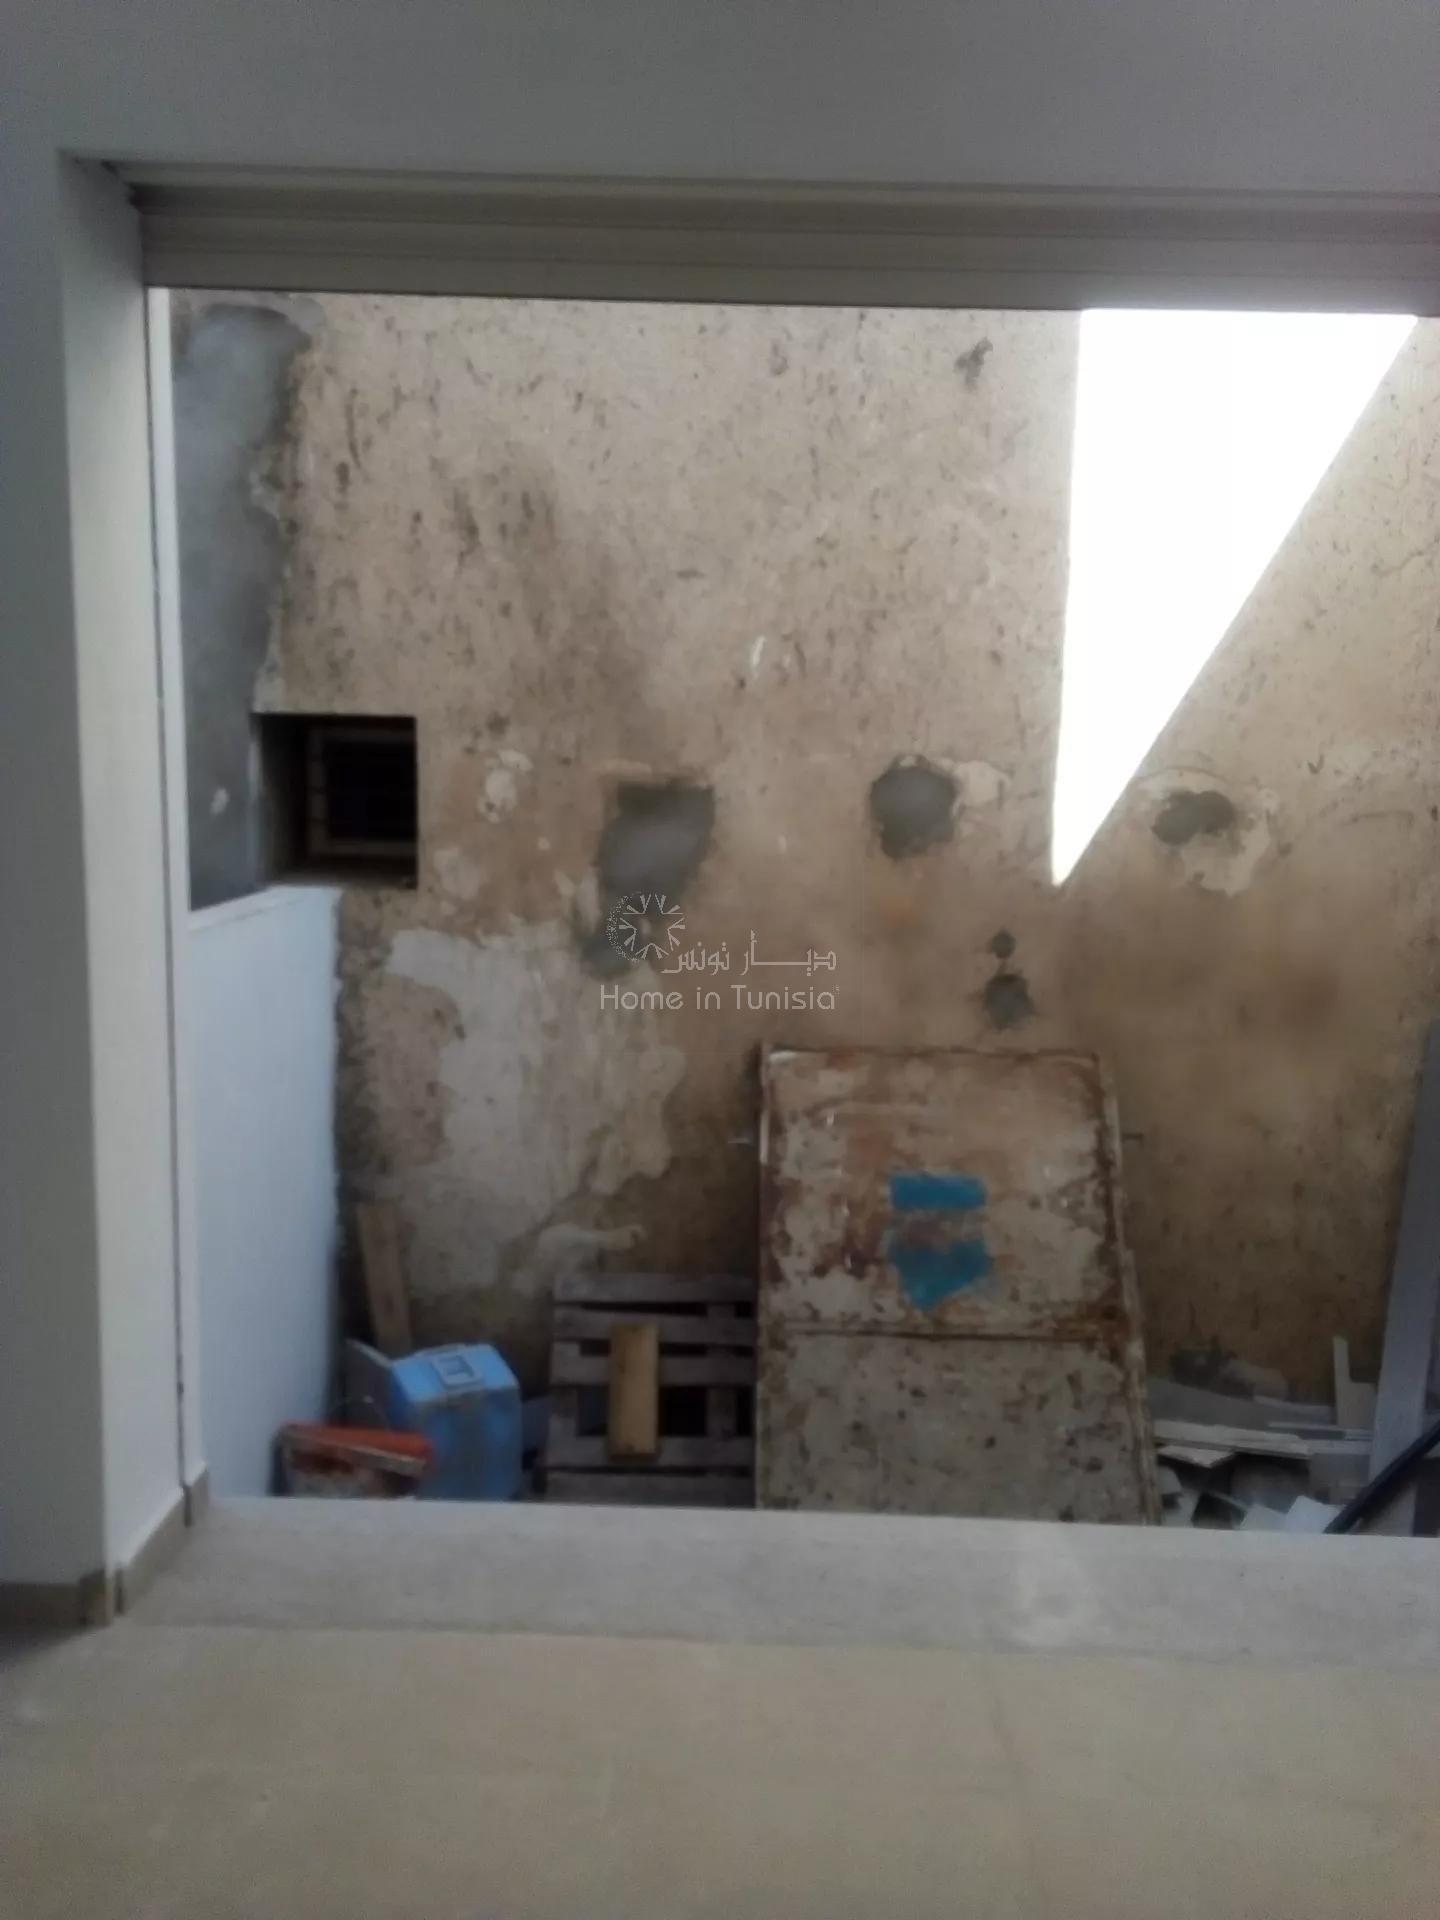 Location Local commercial - La Marsa Plage - Tunisie